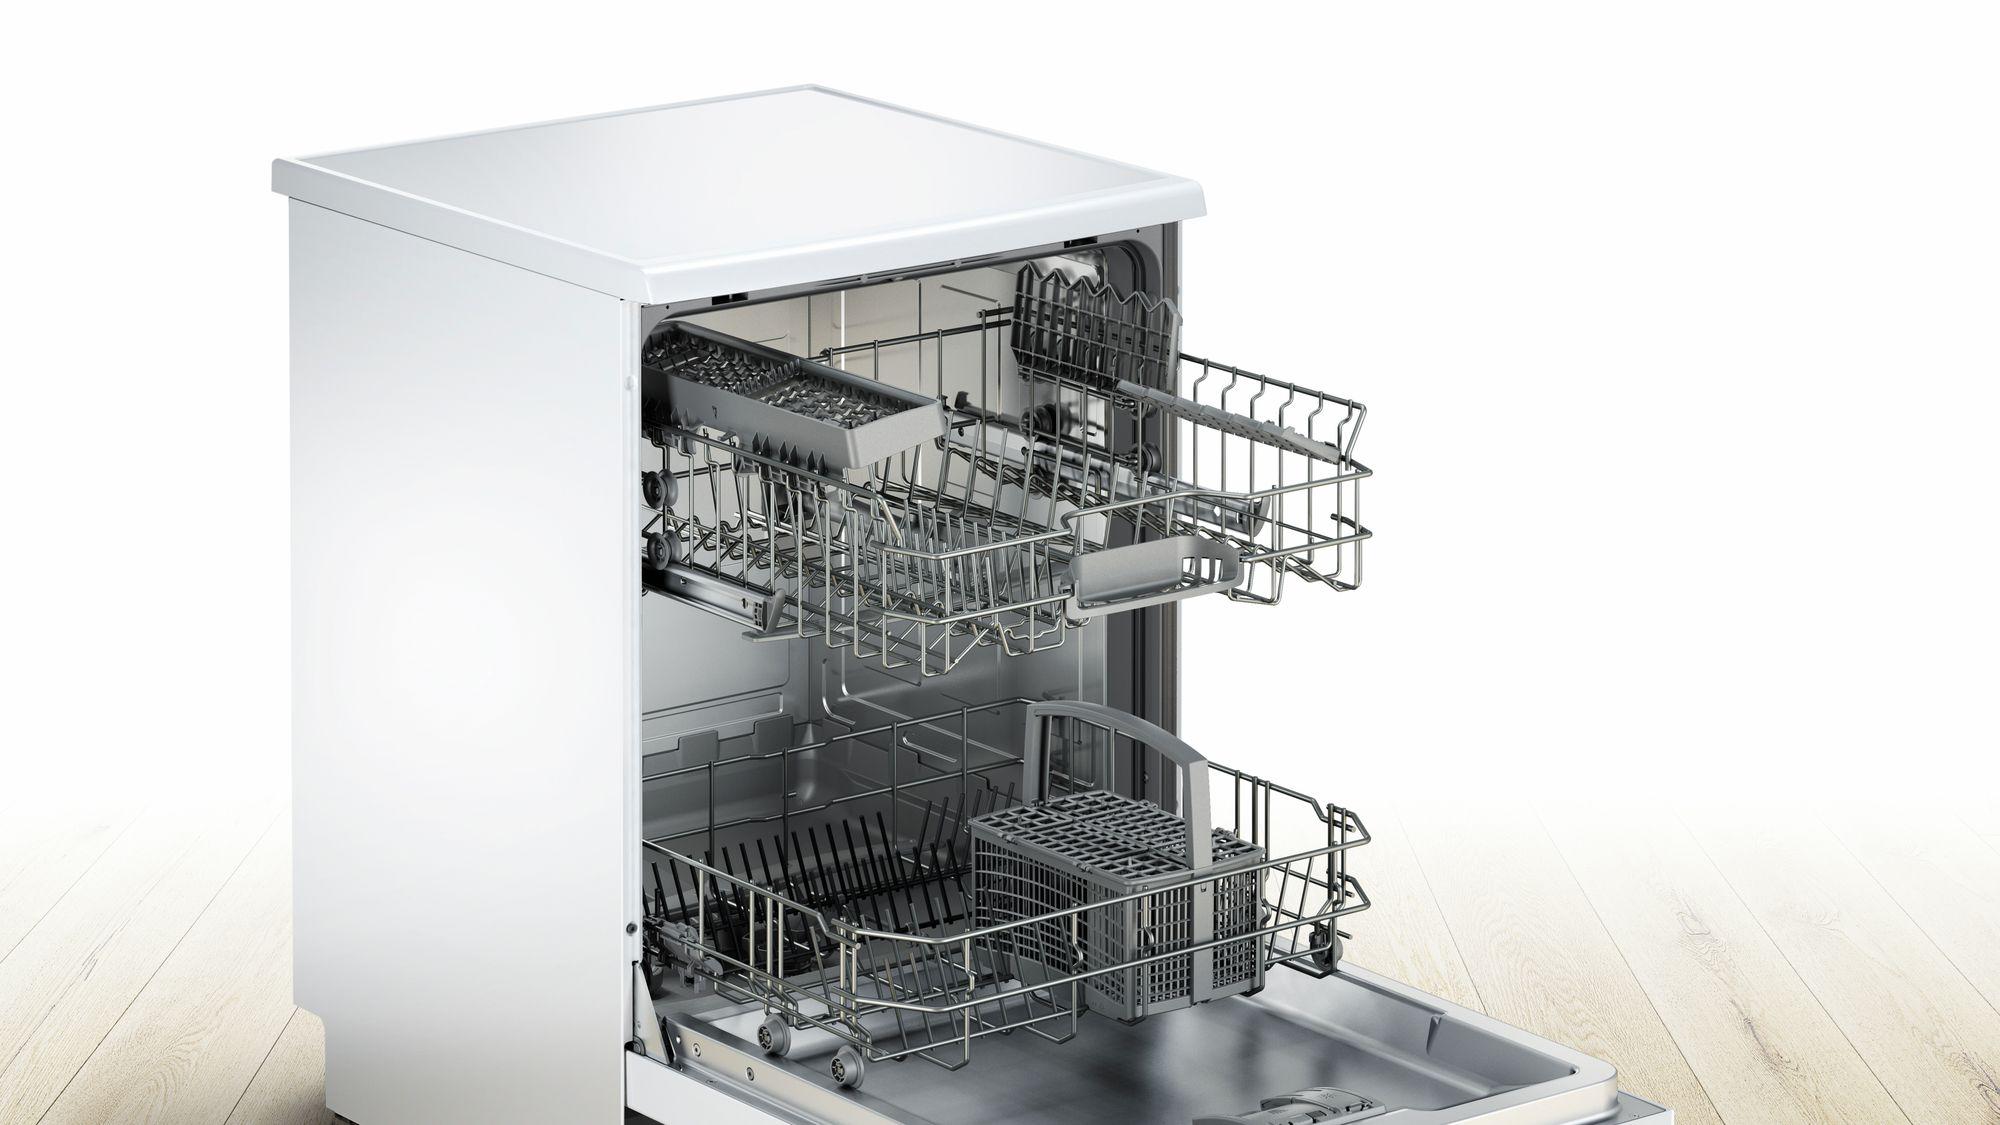 Serie | 4 Silence Plus mašina za pranje sudova, 60 cm samostalna mašina za pranje sudova, bela